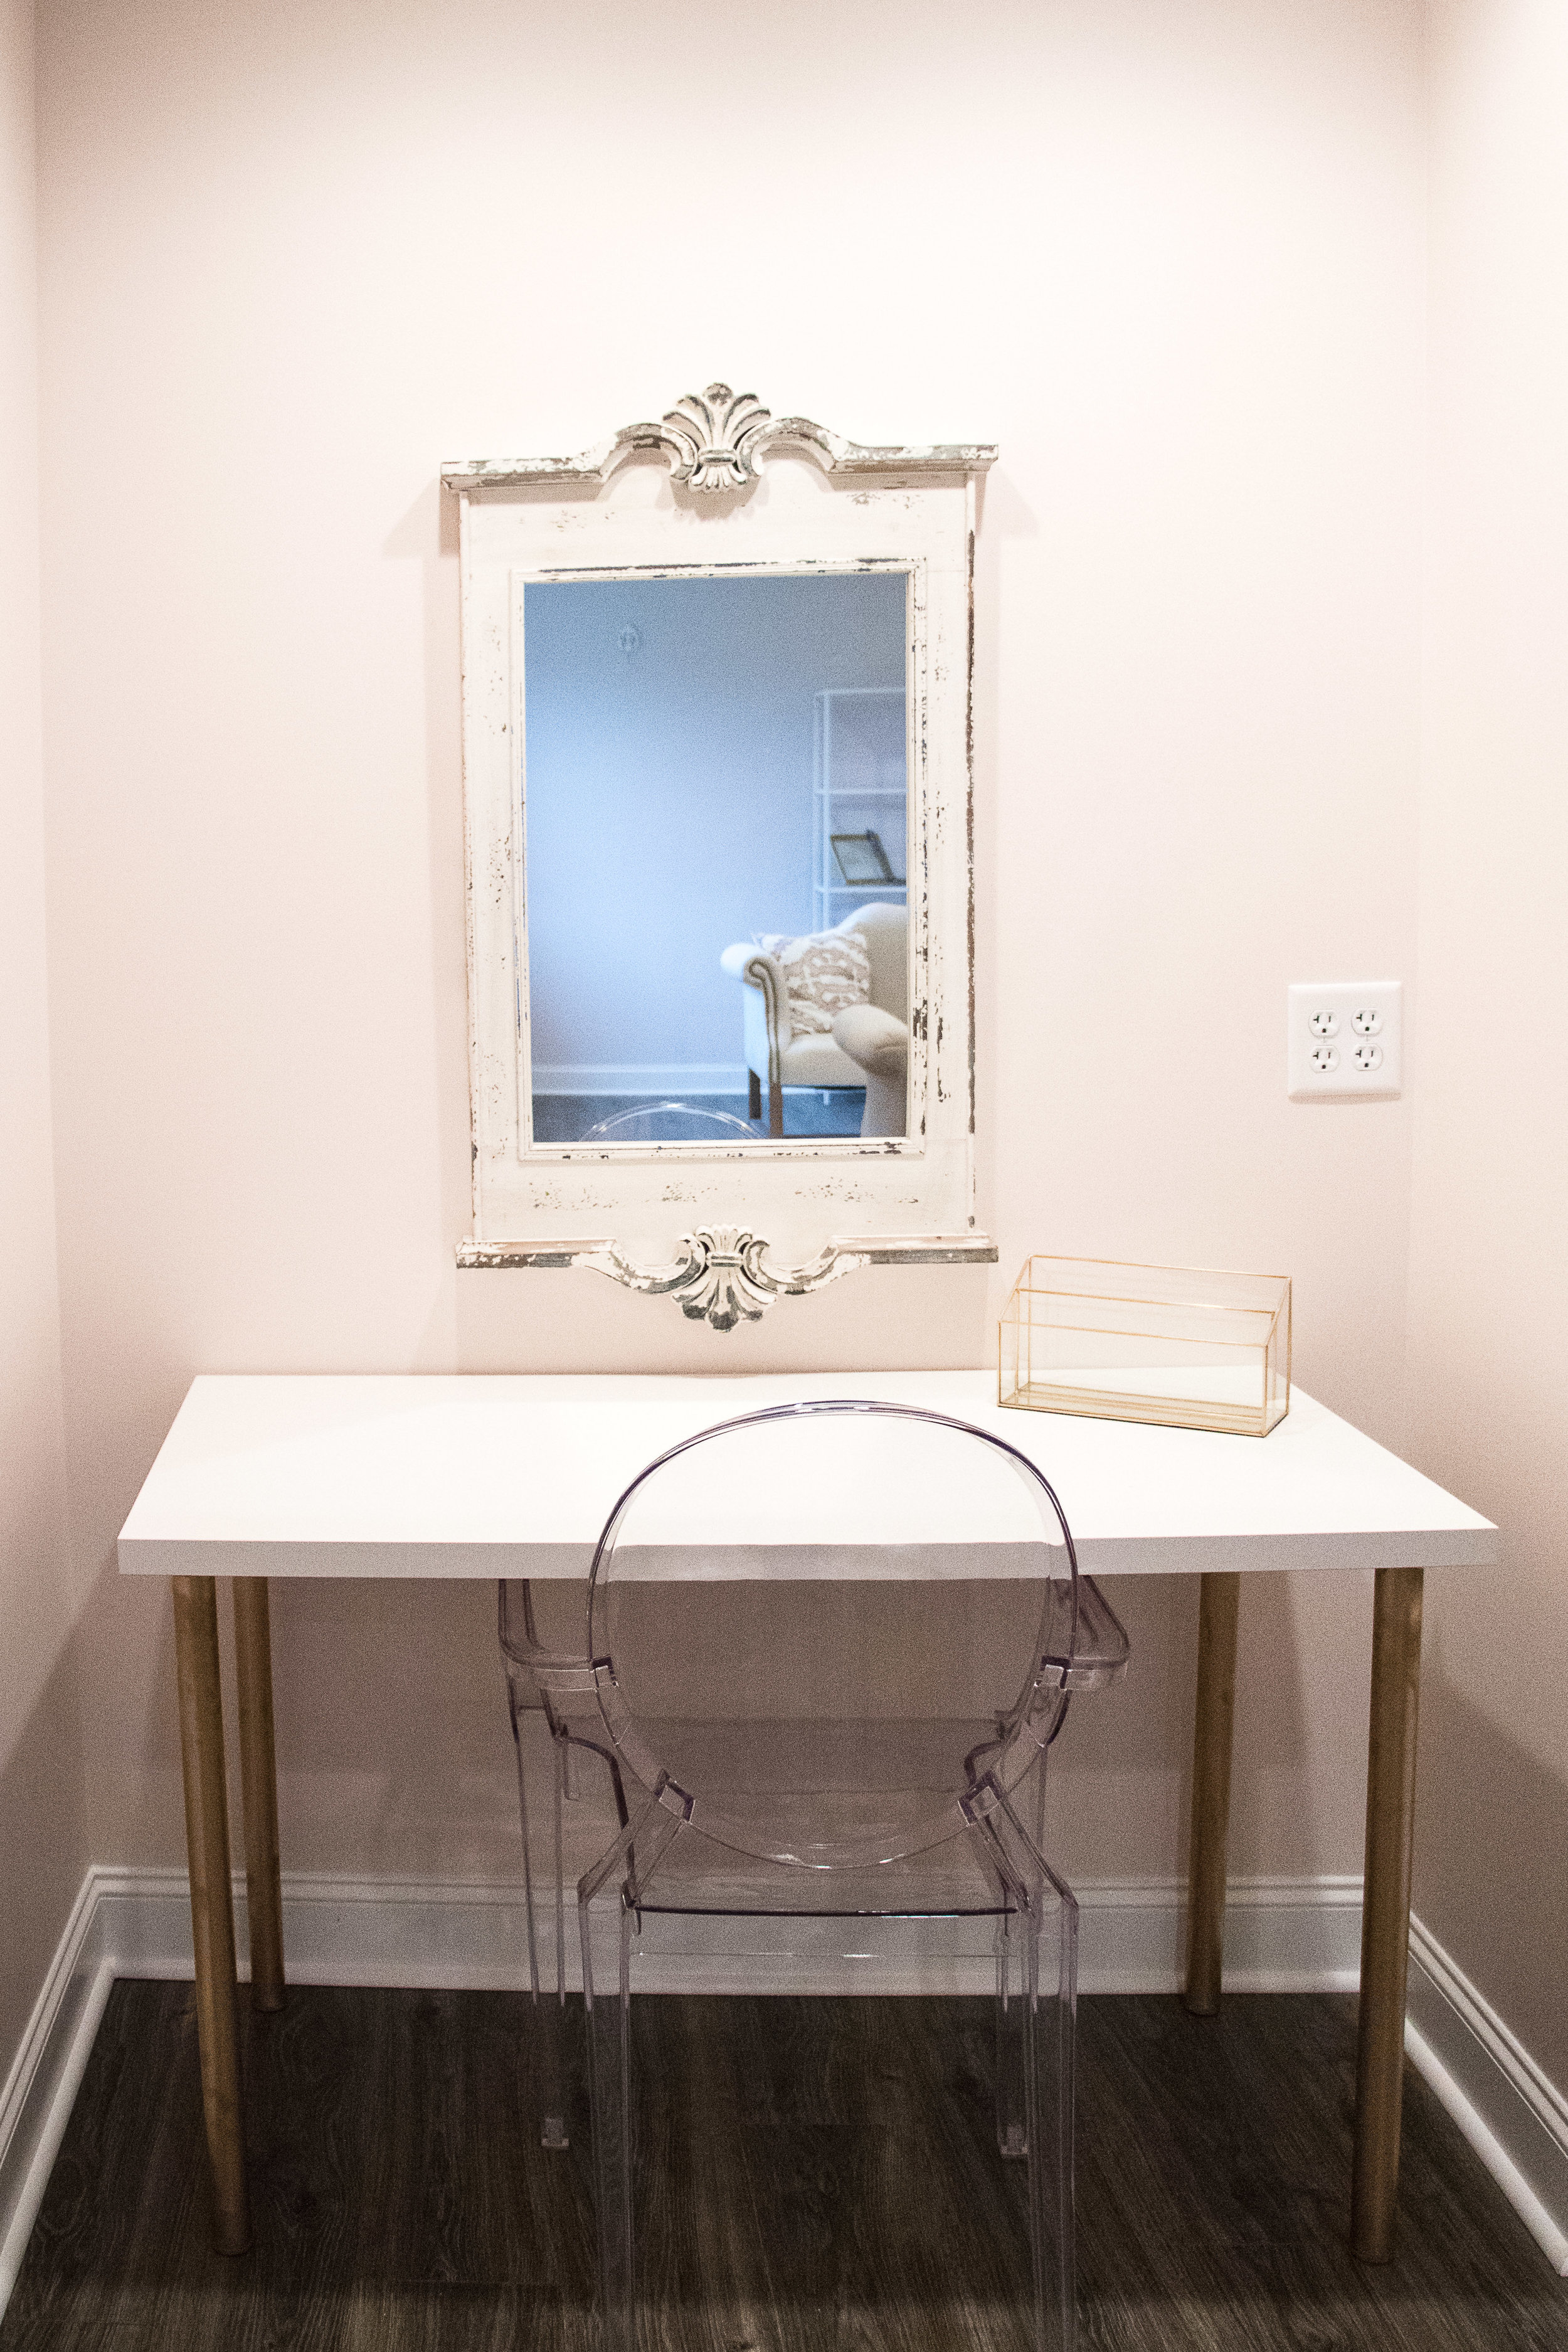 Bridal Suite captured by Janelle Hale